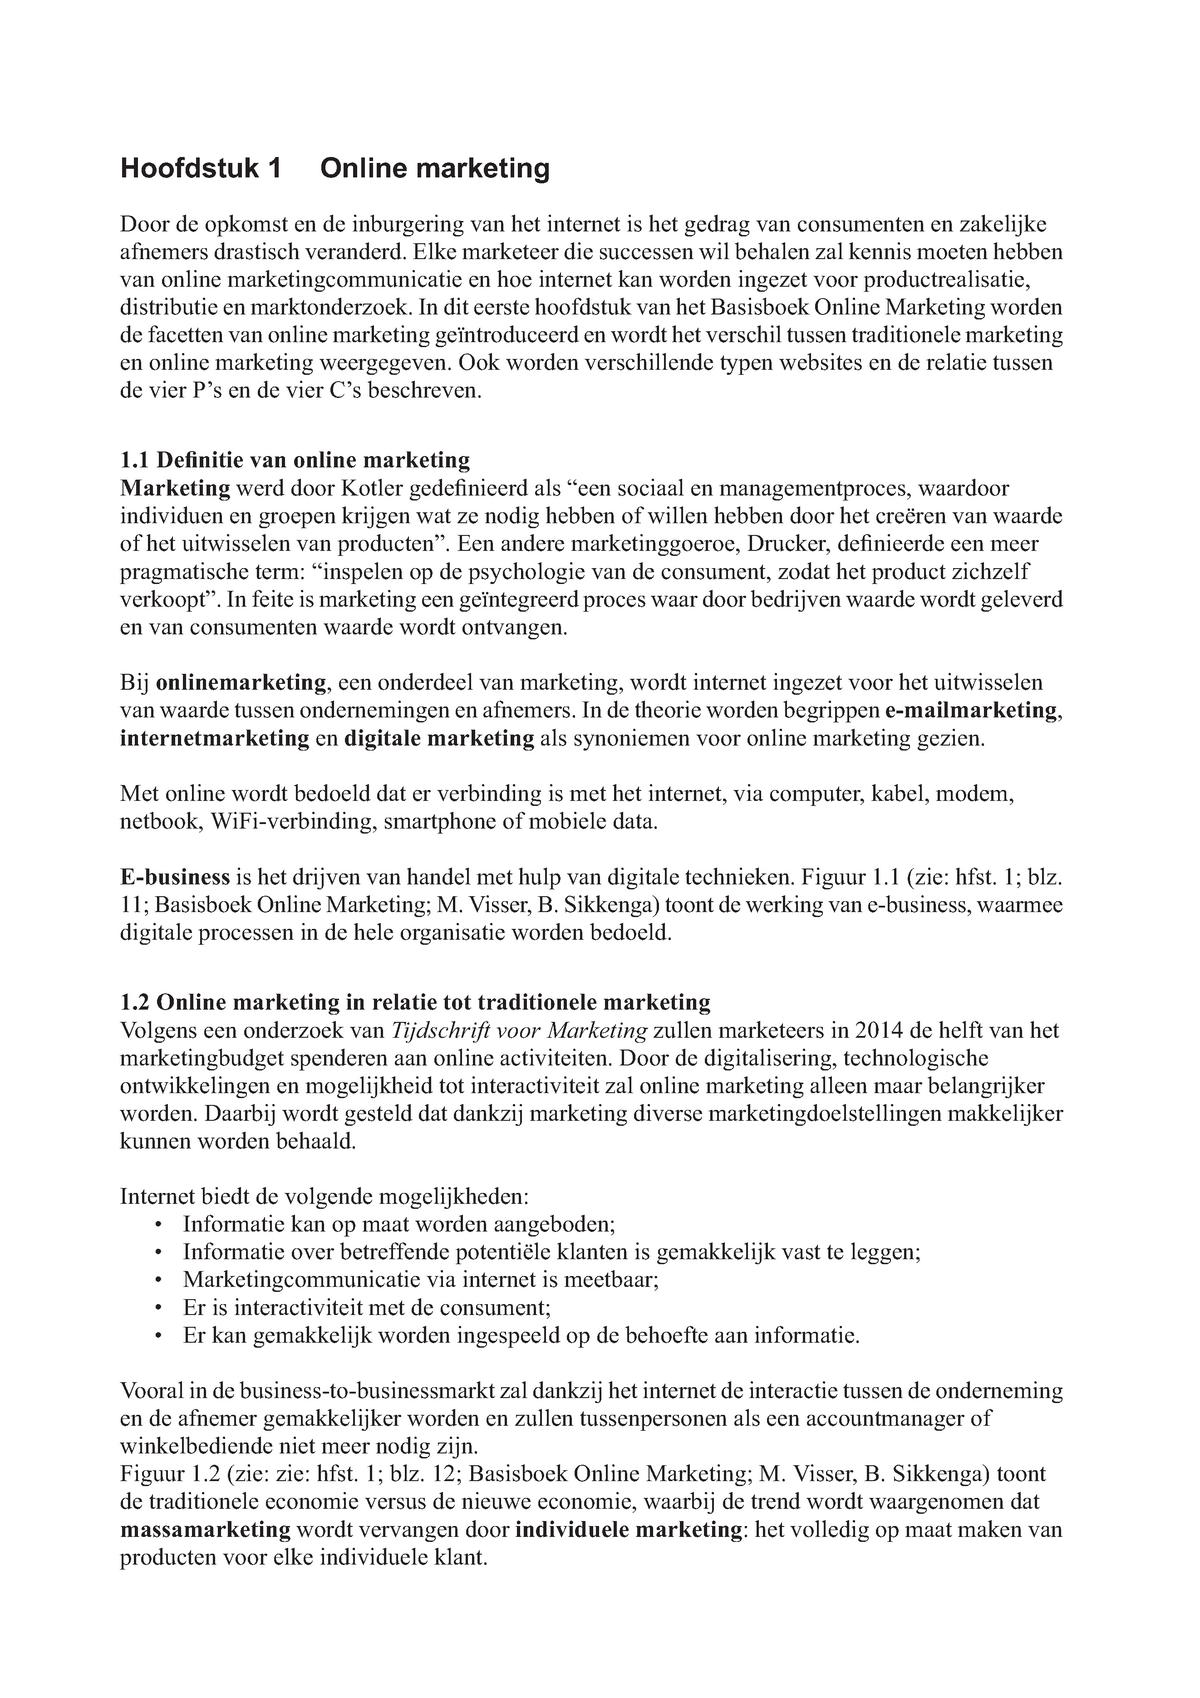 Samenvatting Basisboek Online Marketing Ppostma Sales